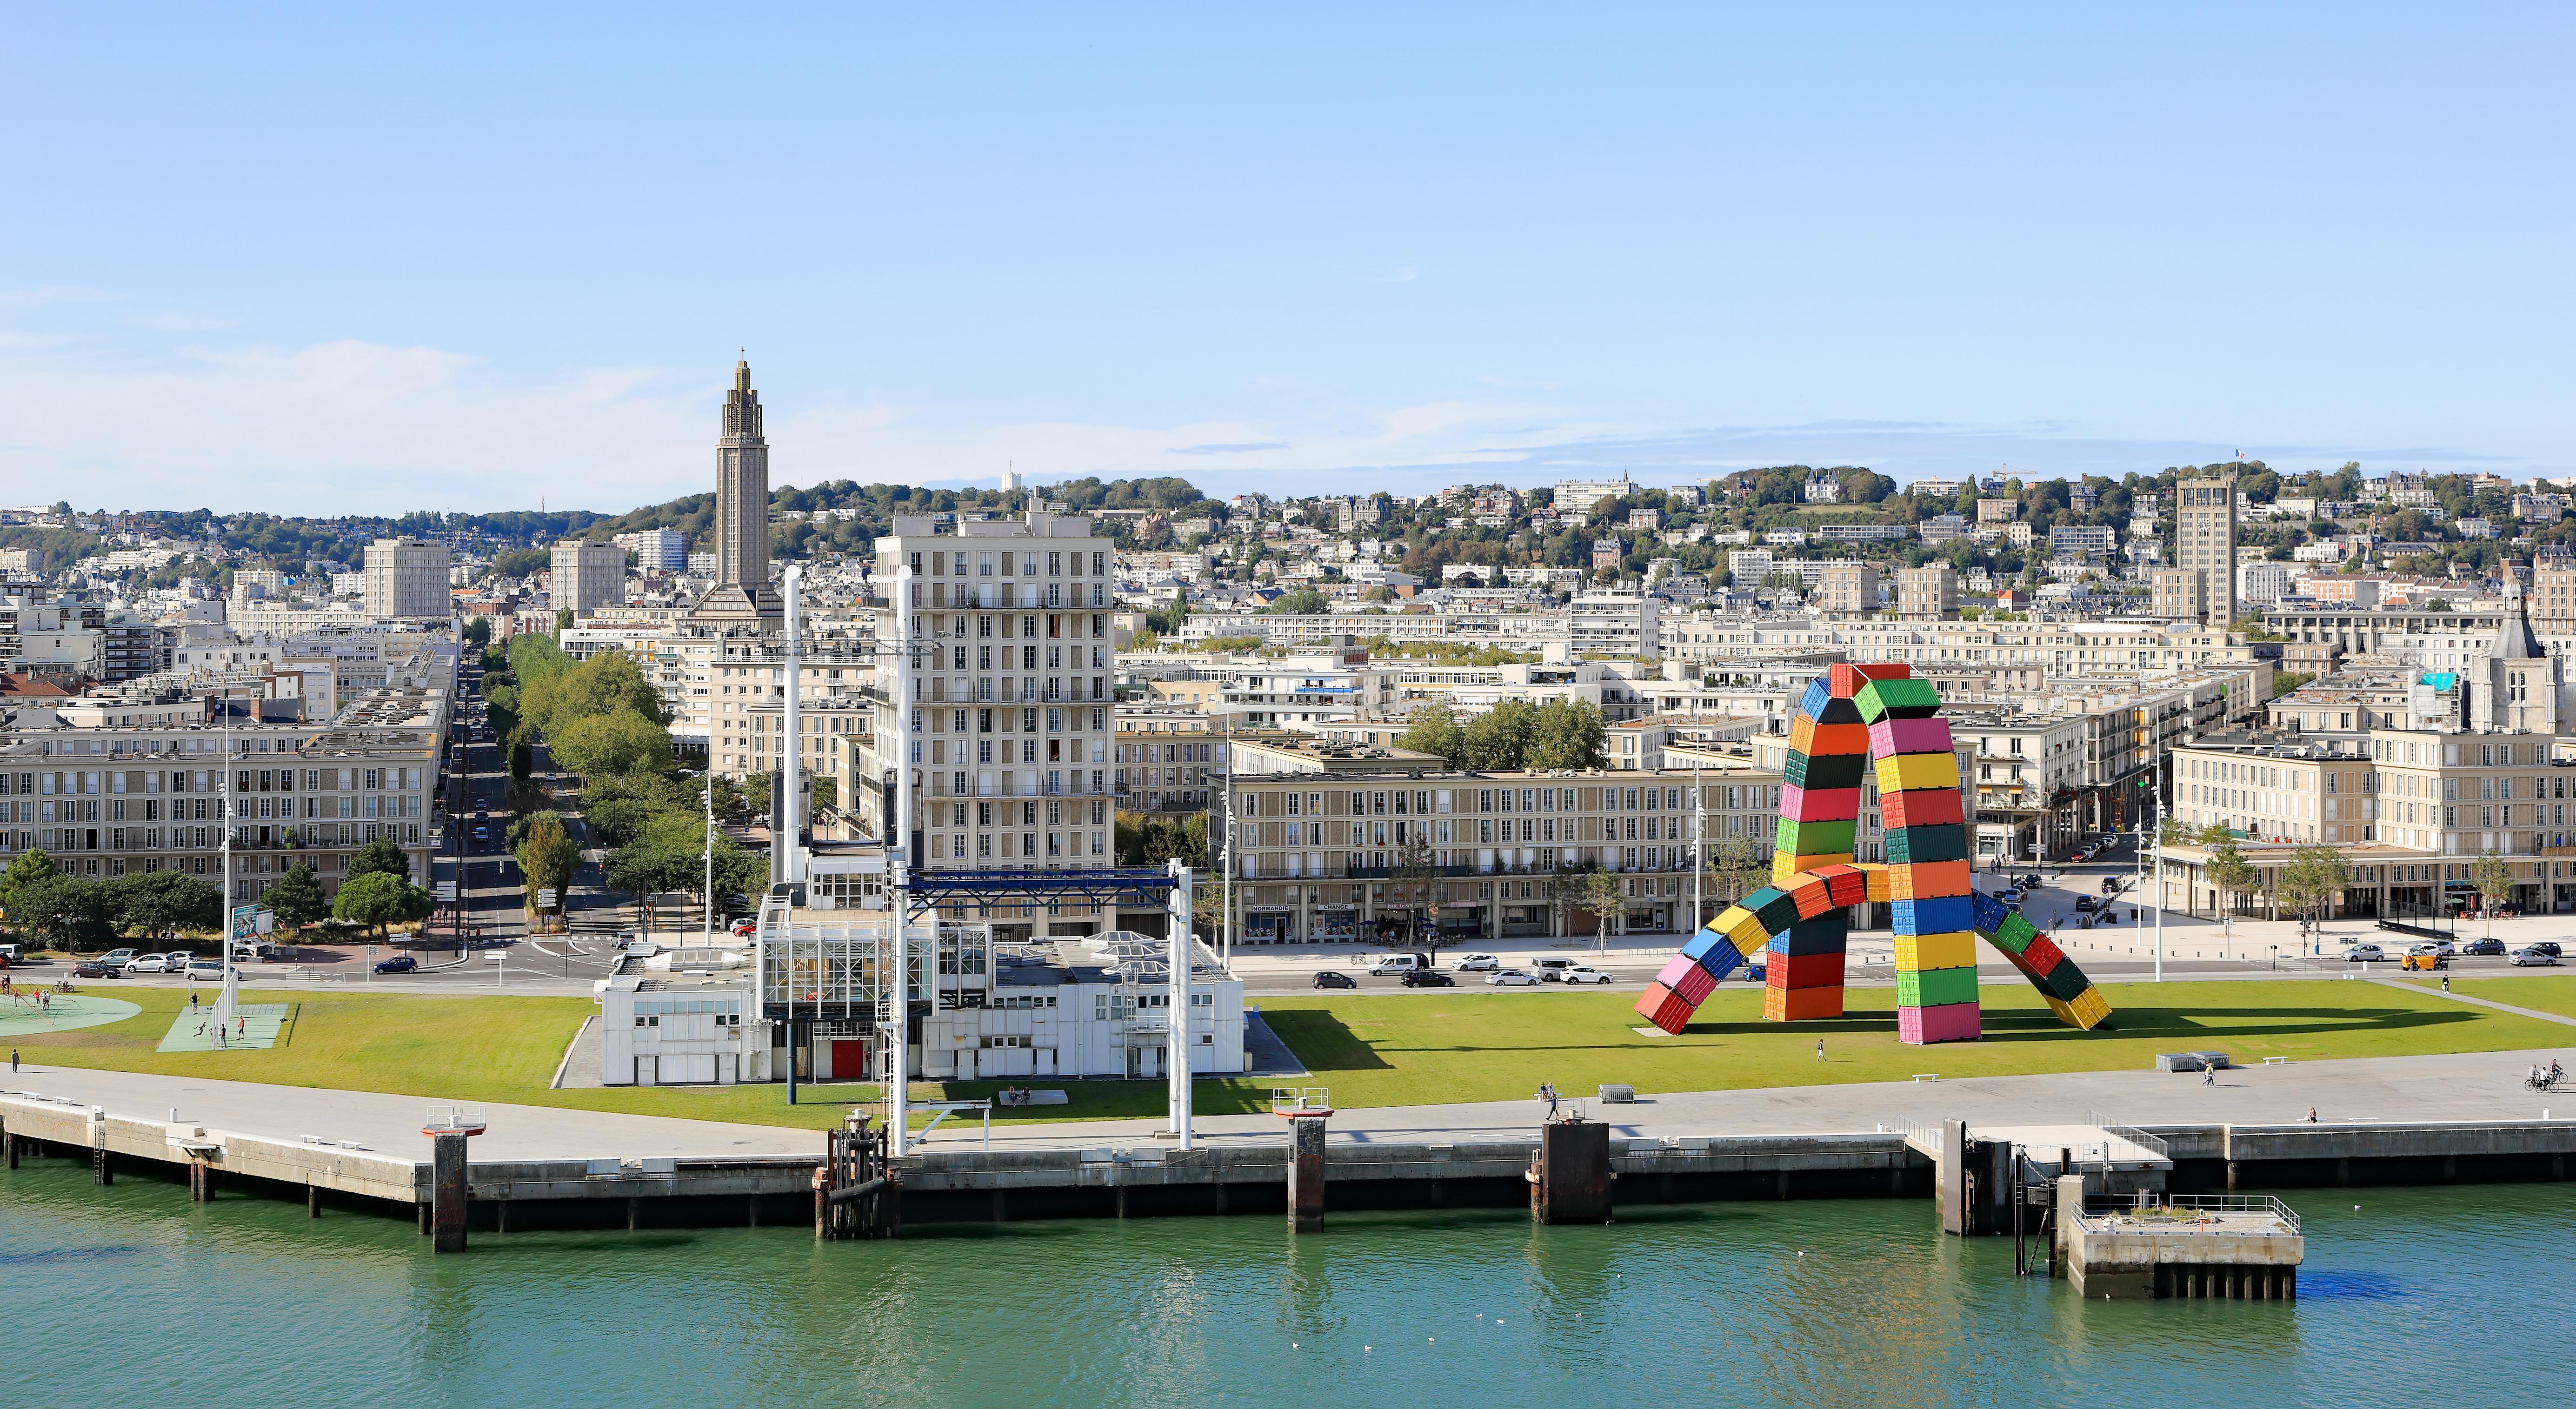 Le Havre Gpedia Your Encyclopedia